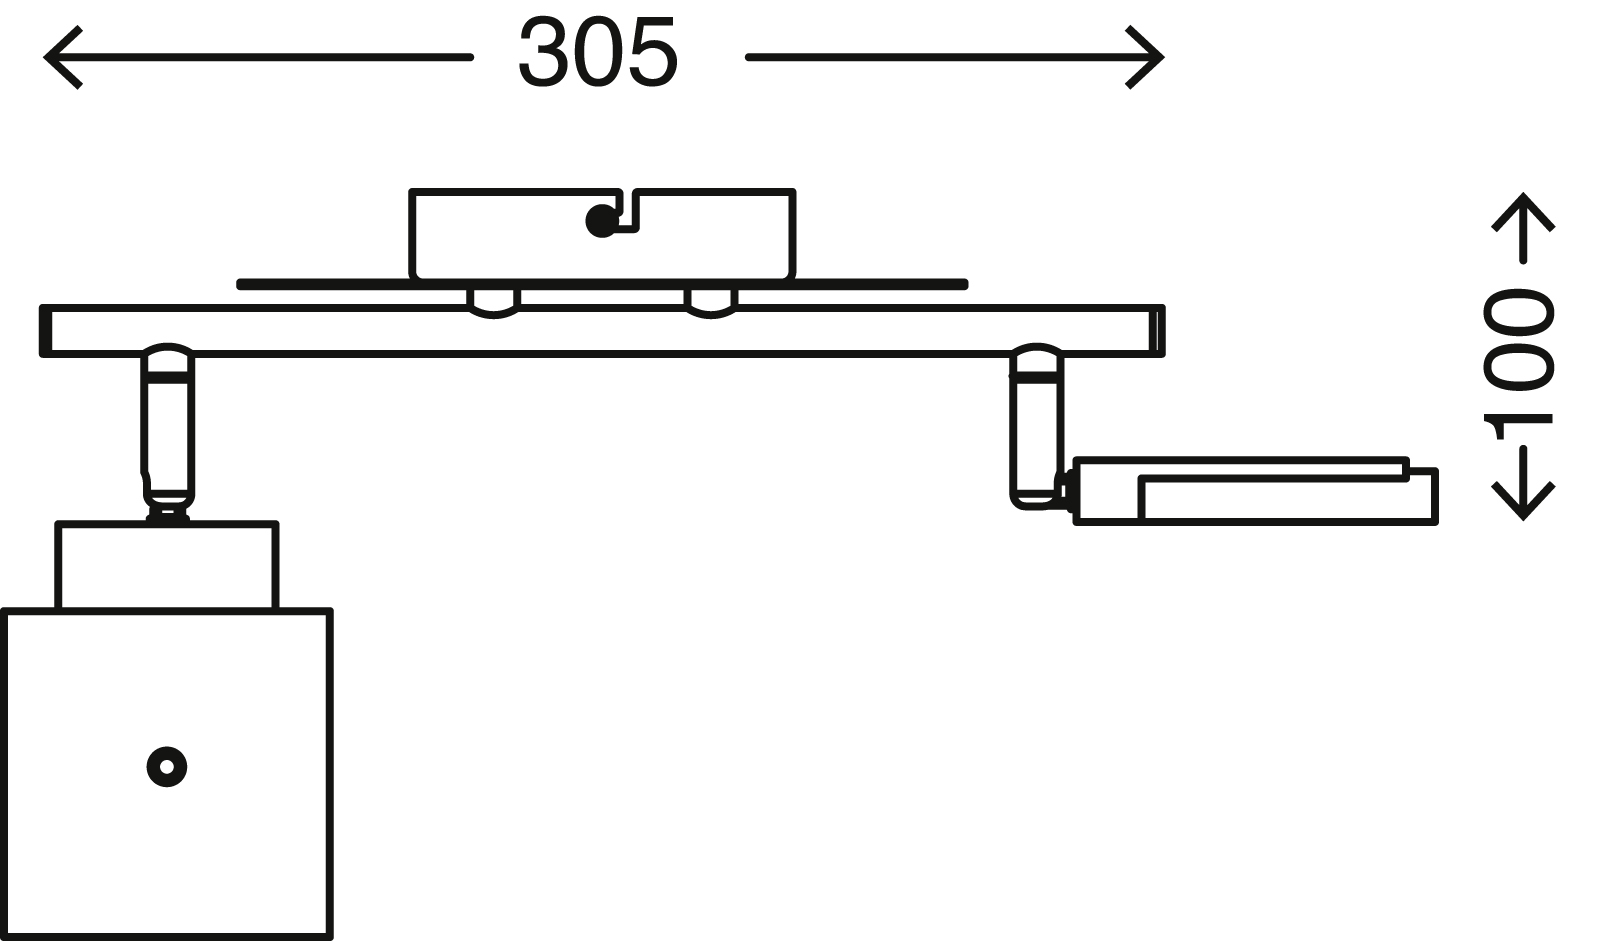 LED Spot Deckenleuchte, 30,5 cm, 9 W, Gold